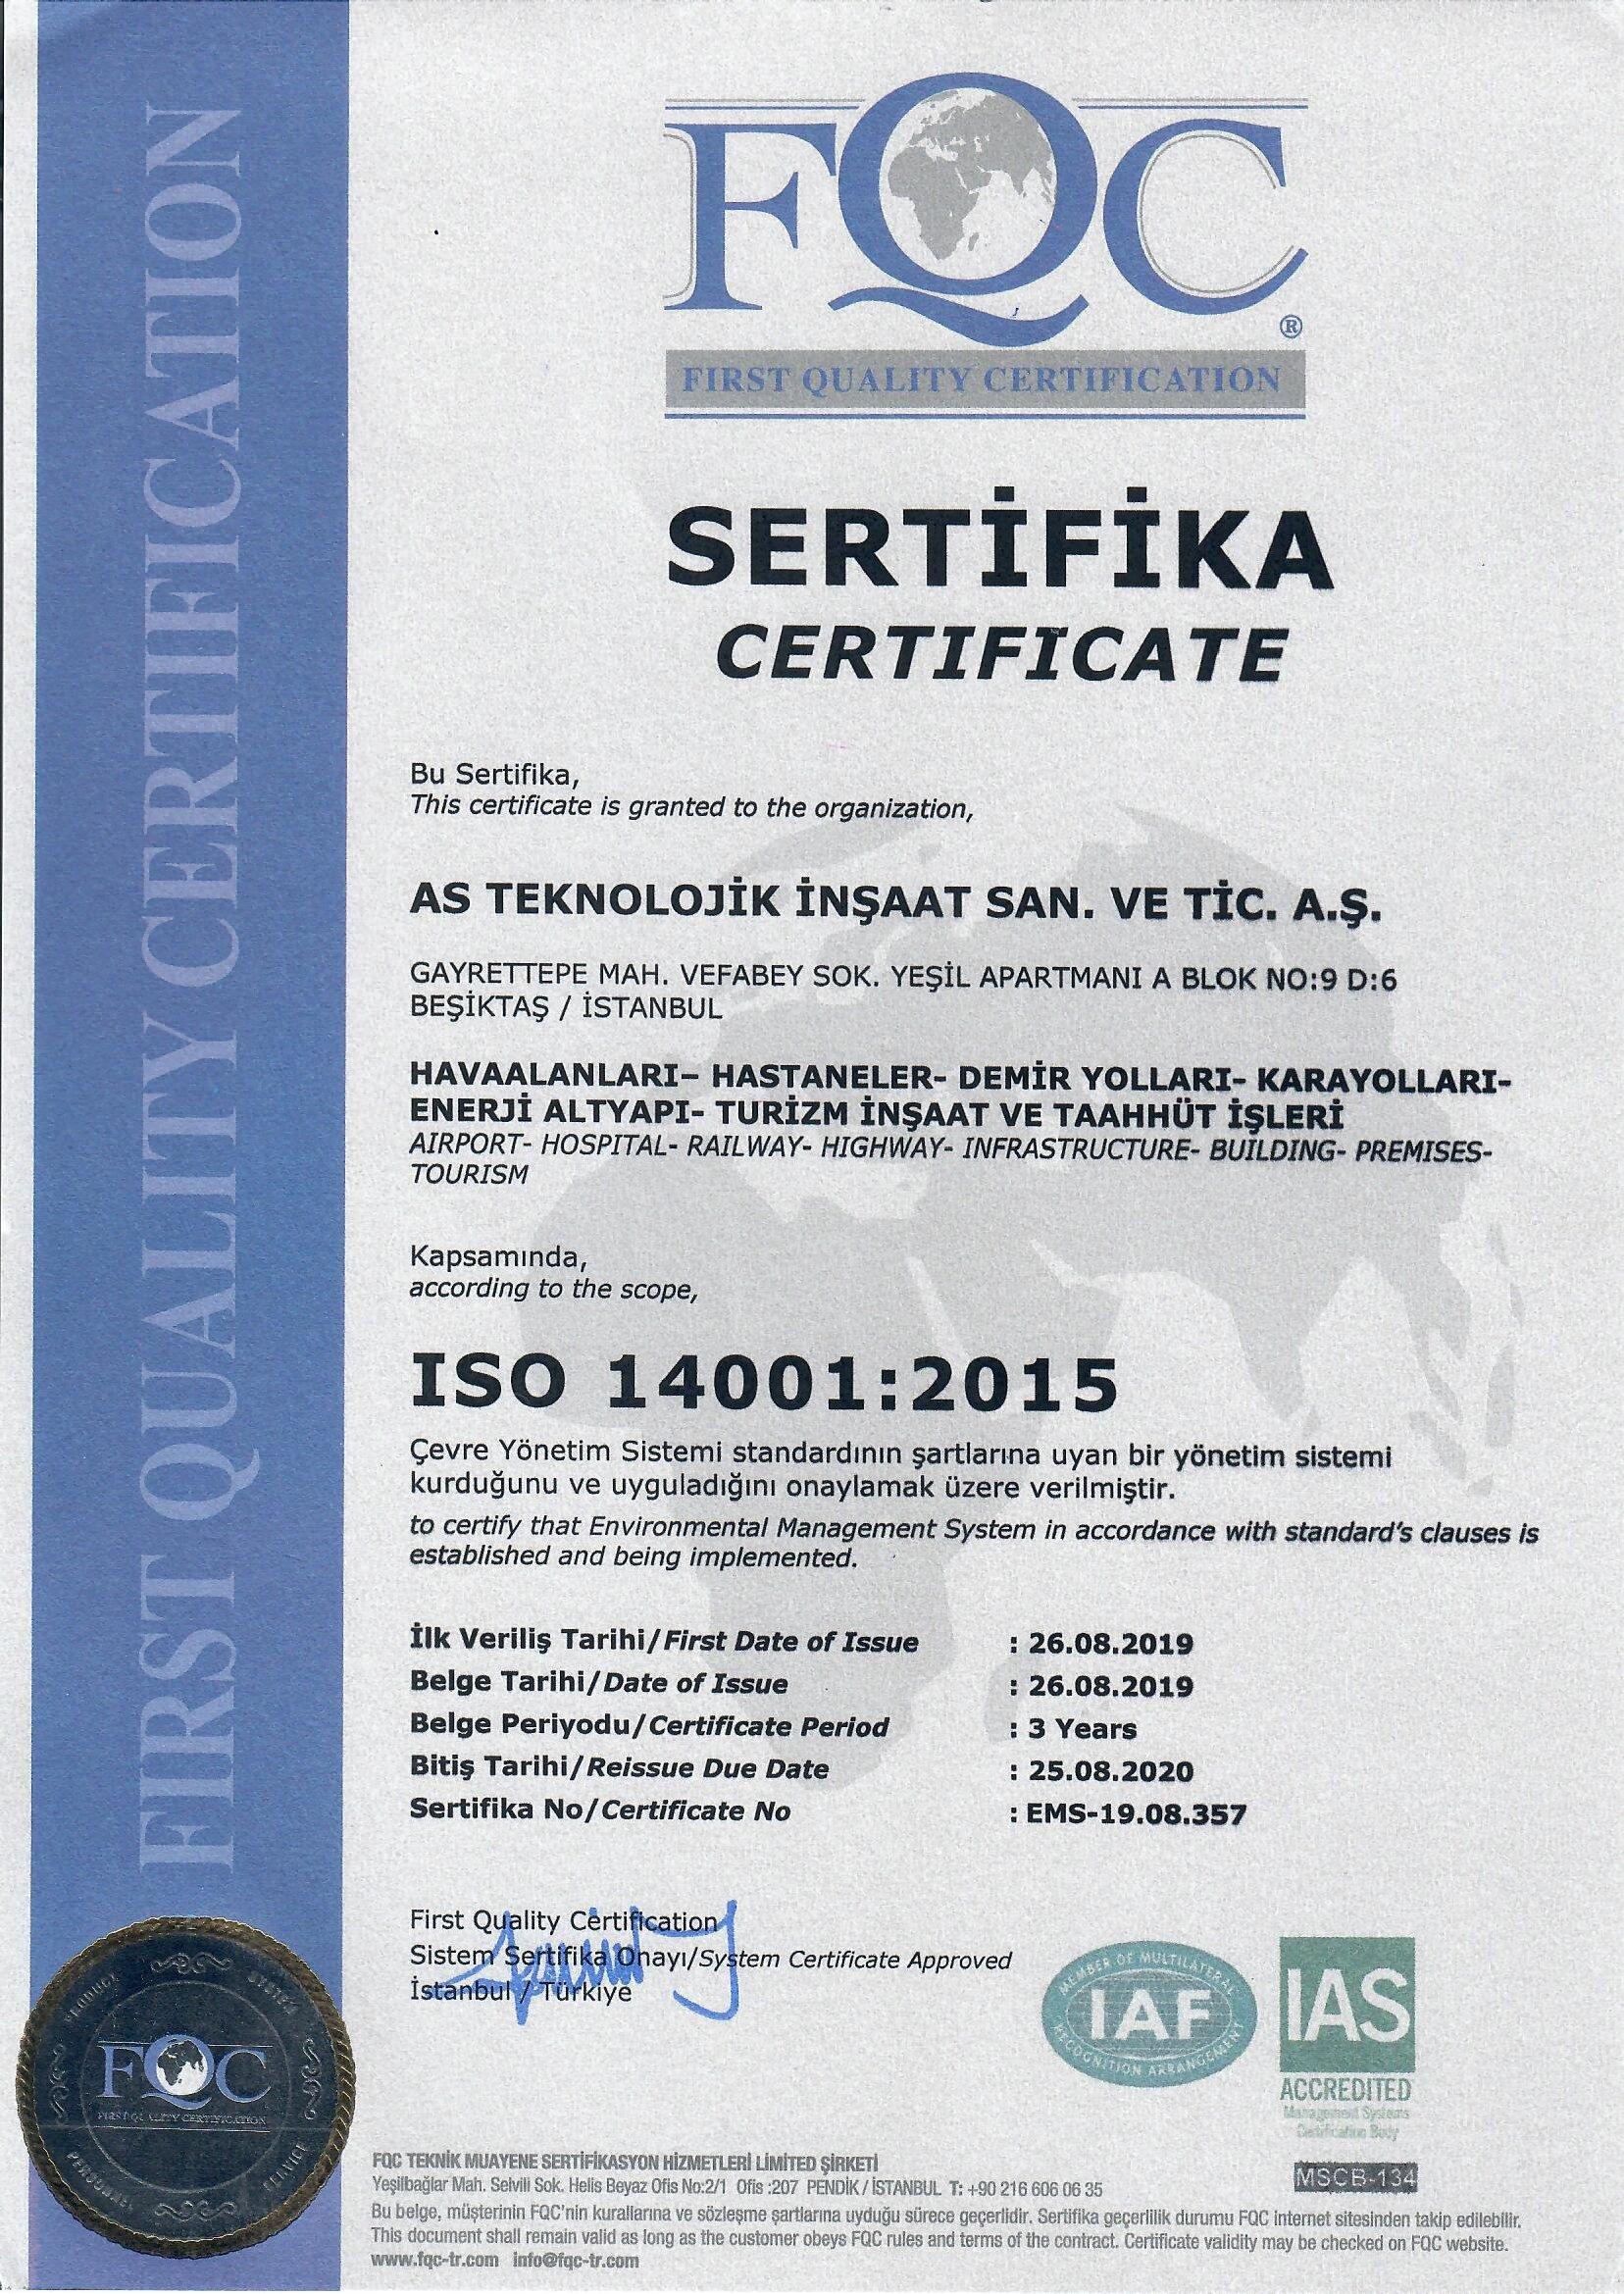 sertifika-2-min.jpg